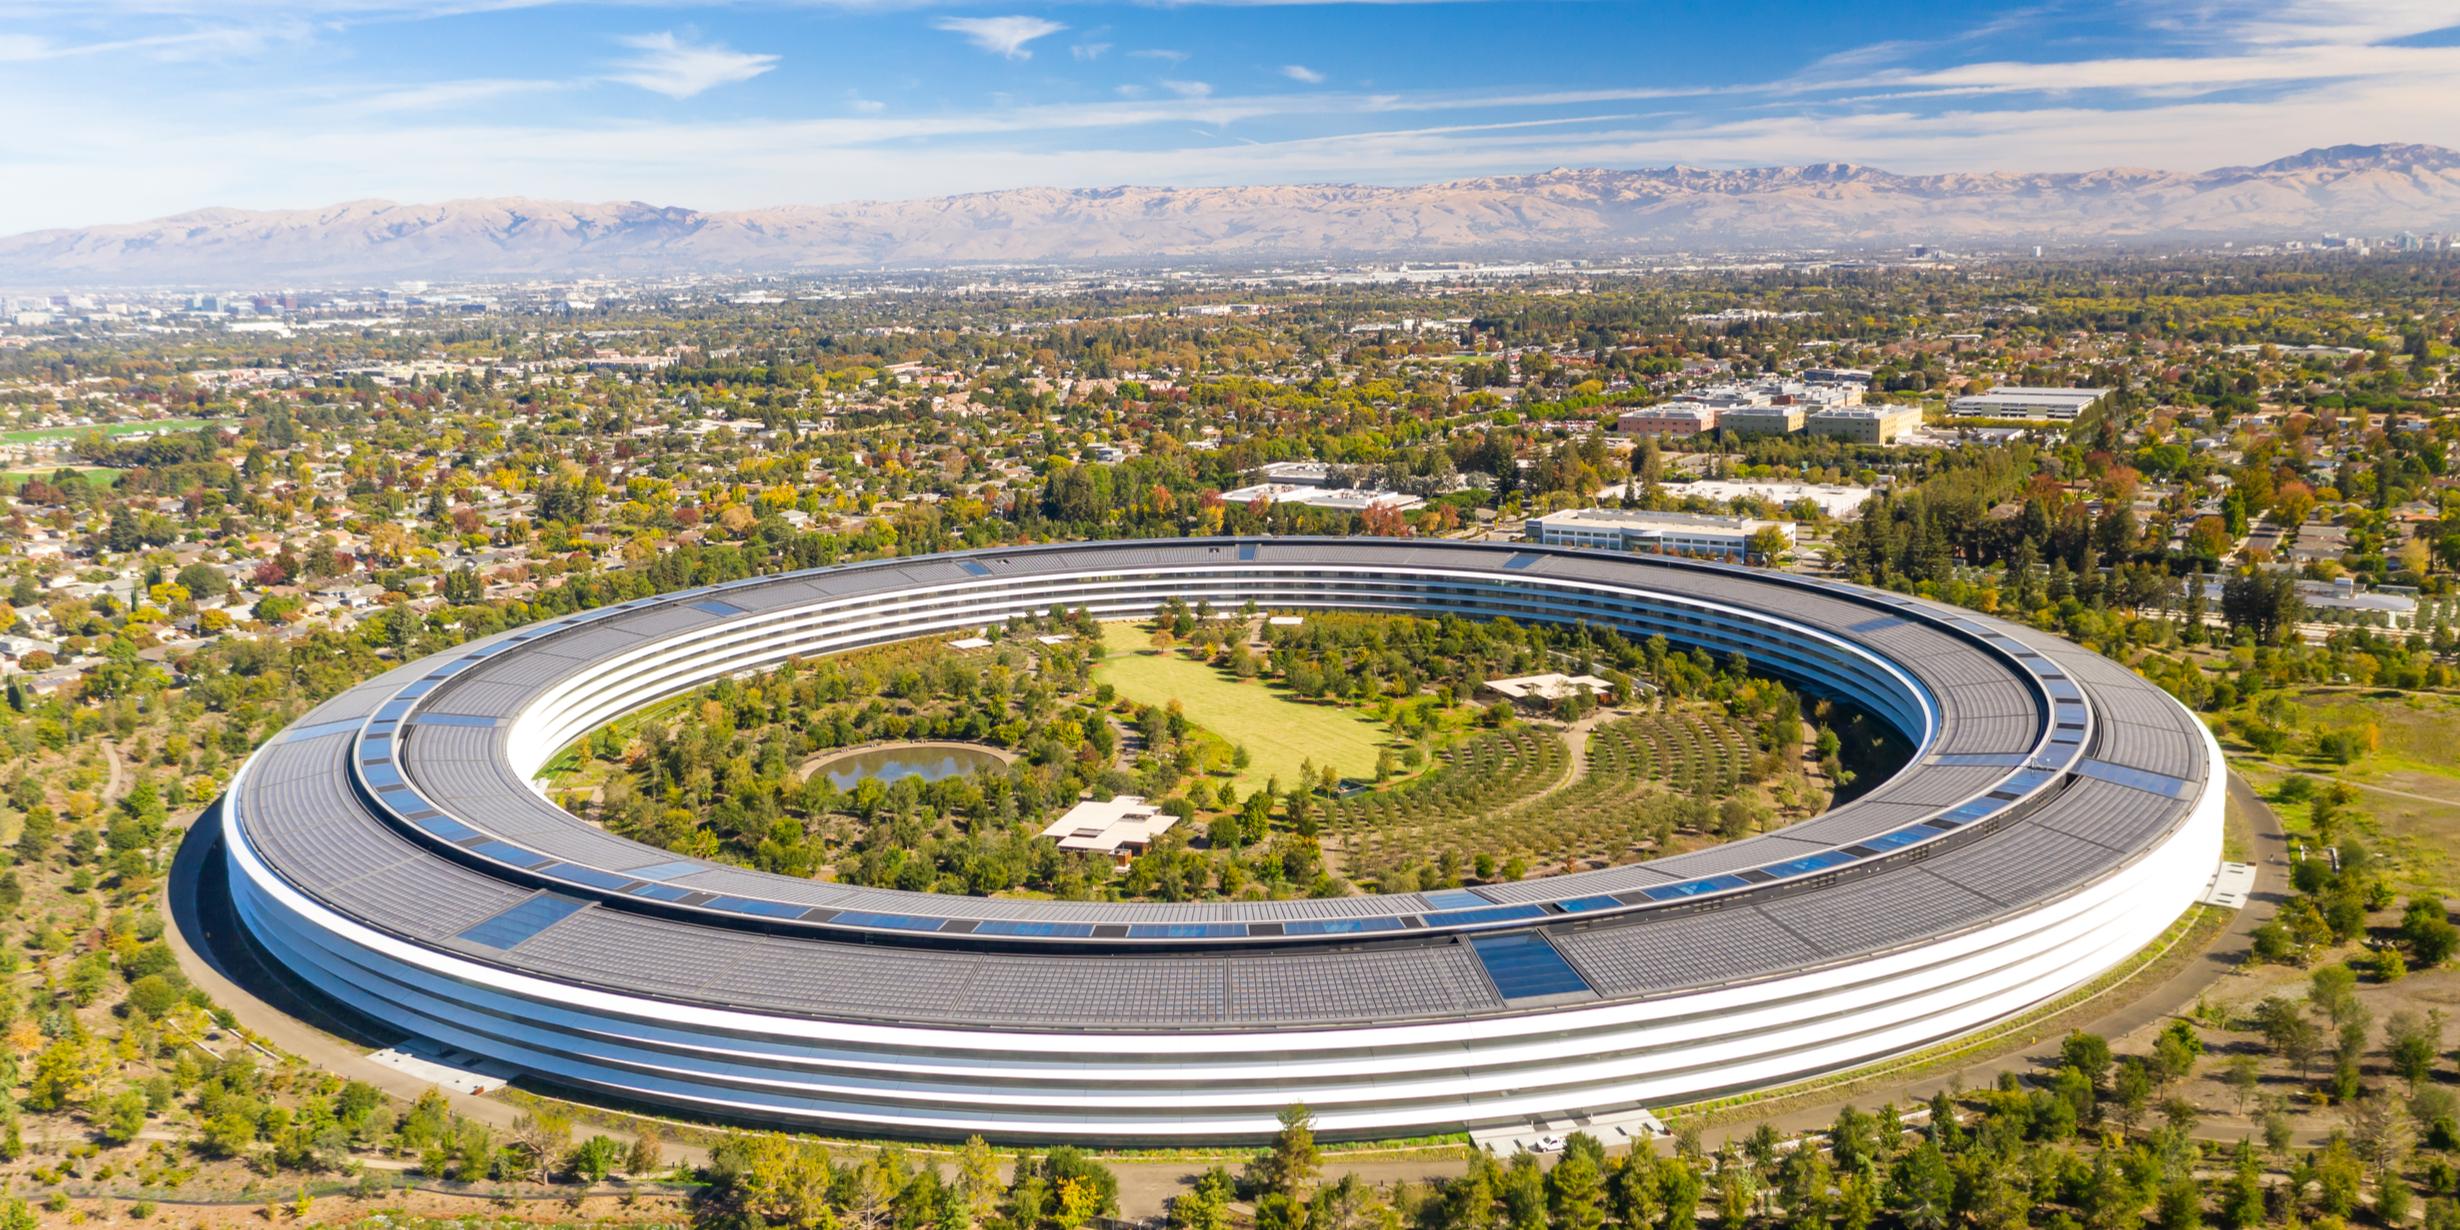 Apple's Mass Turnover in iCloud, Health, AI Teams